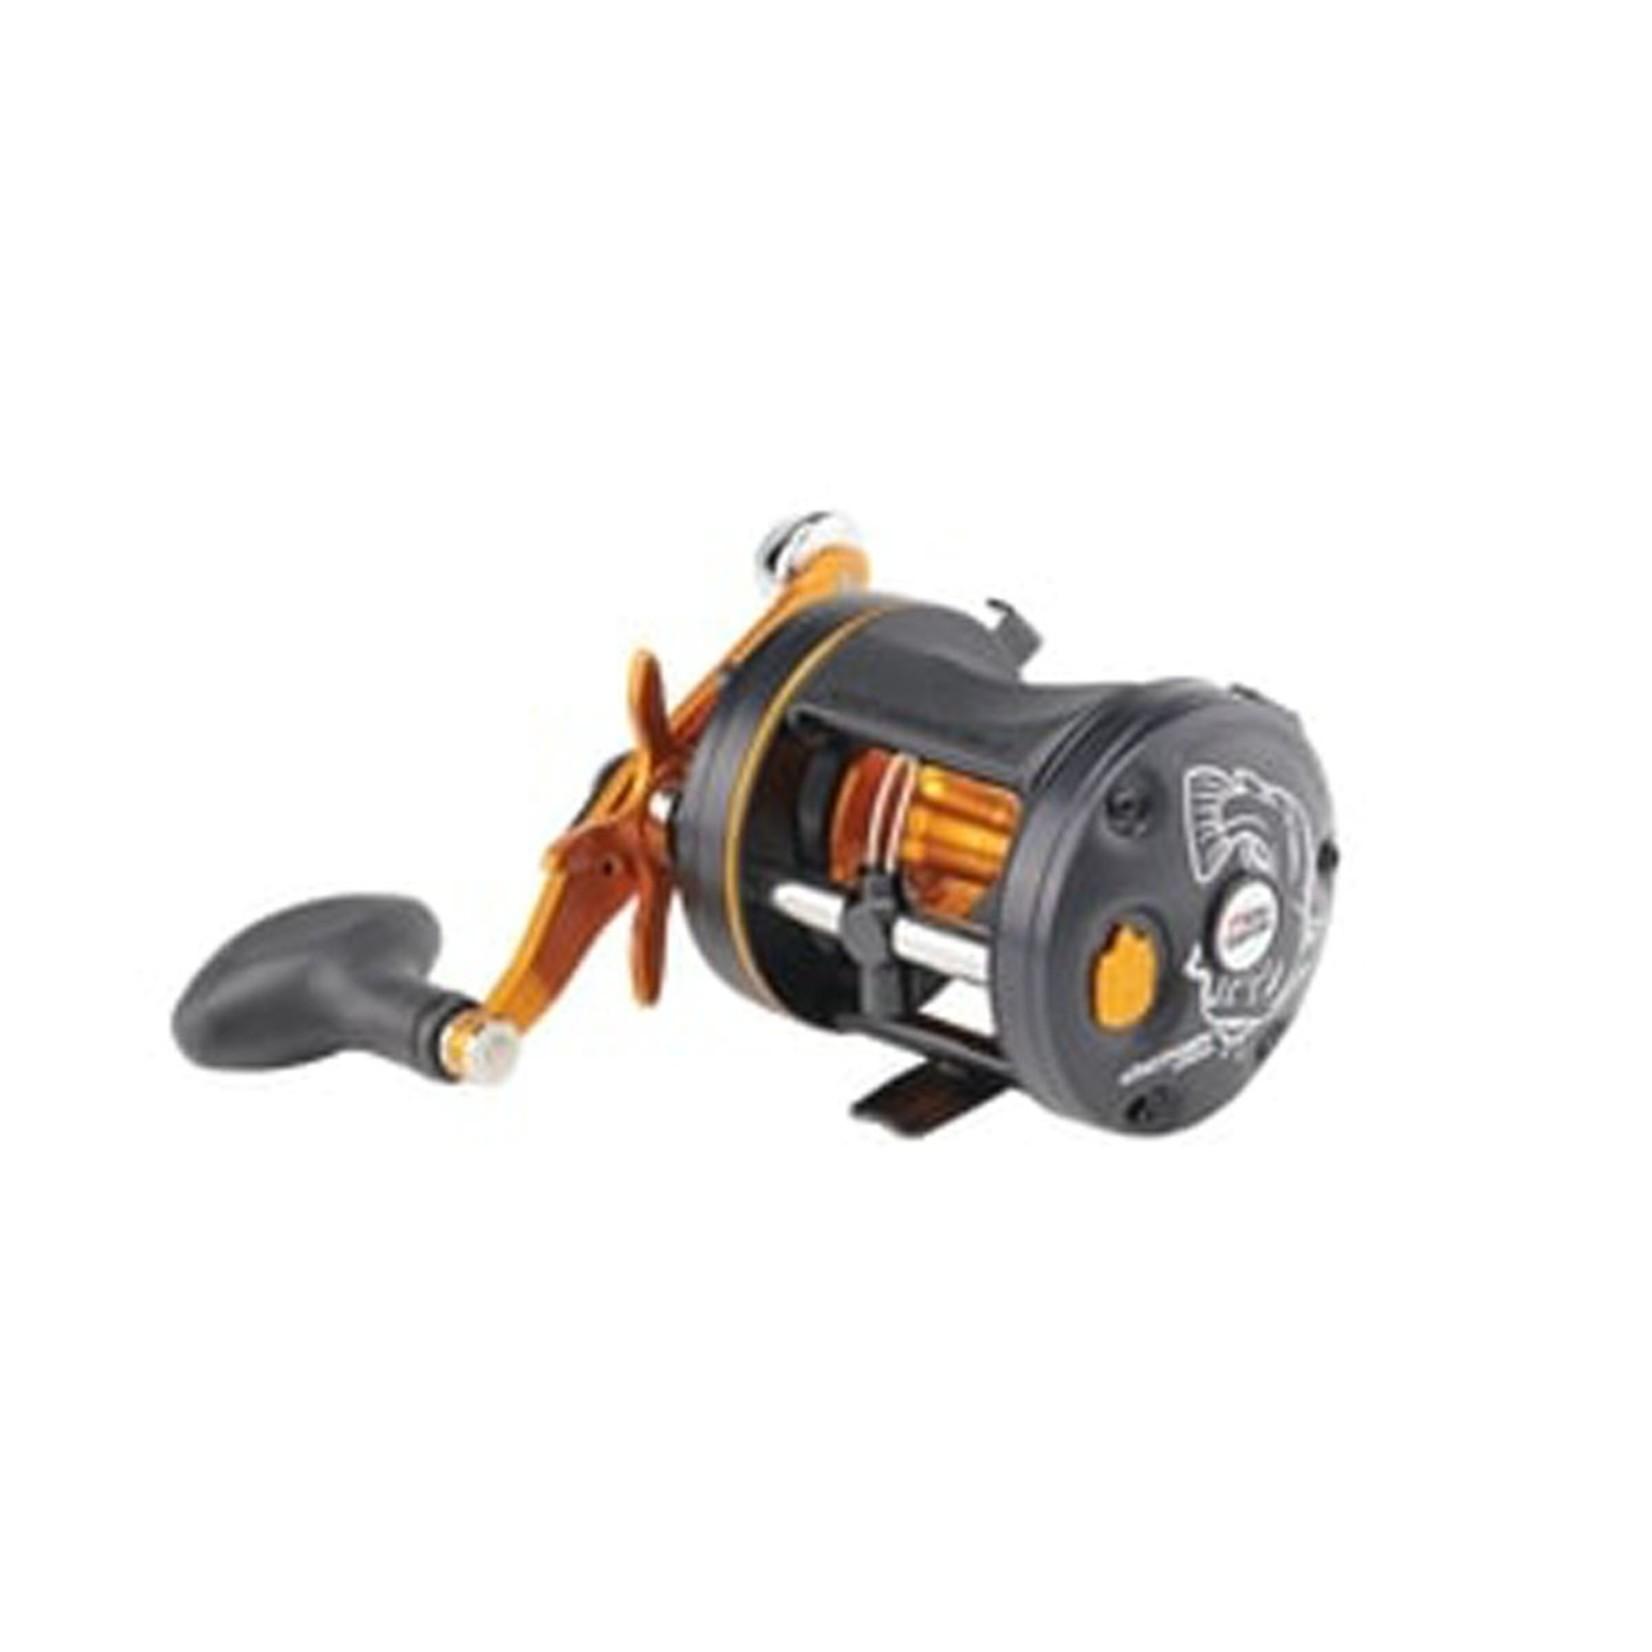 Abu Garcia C3 Catfish Special 6500 Round Baitcast Reel